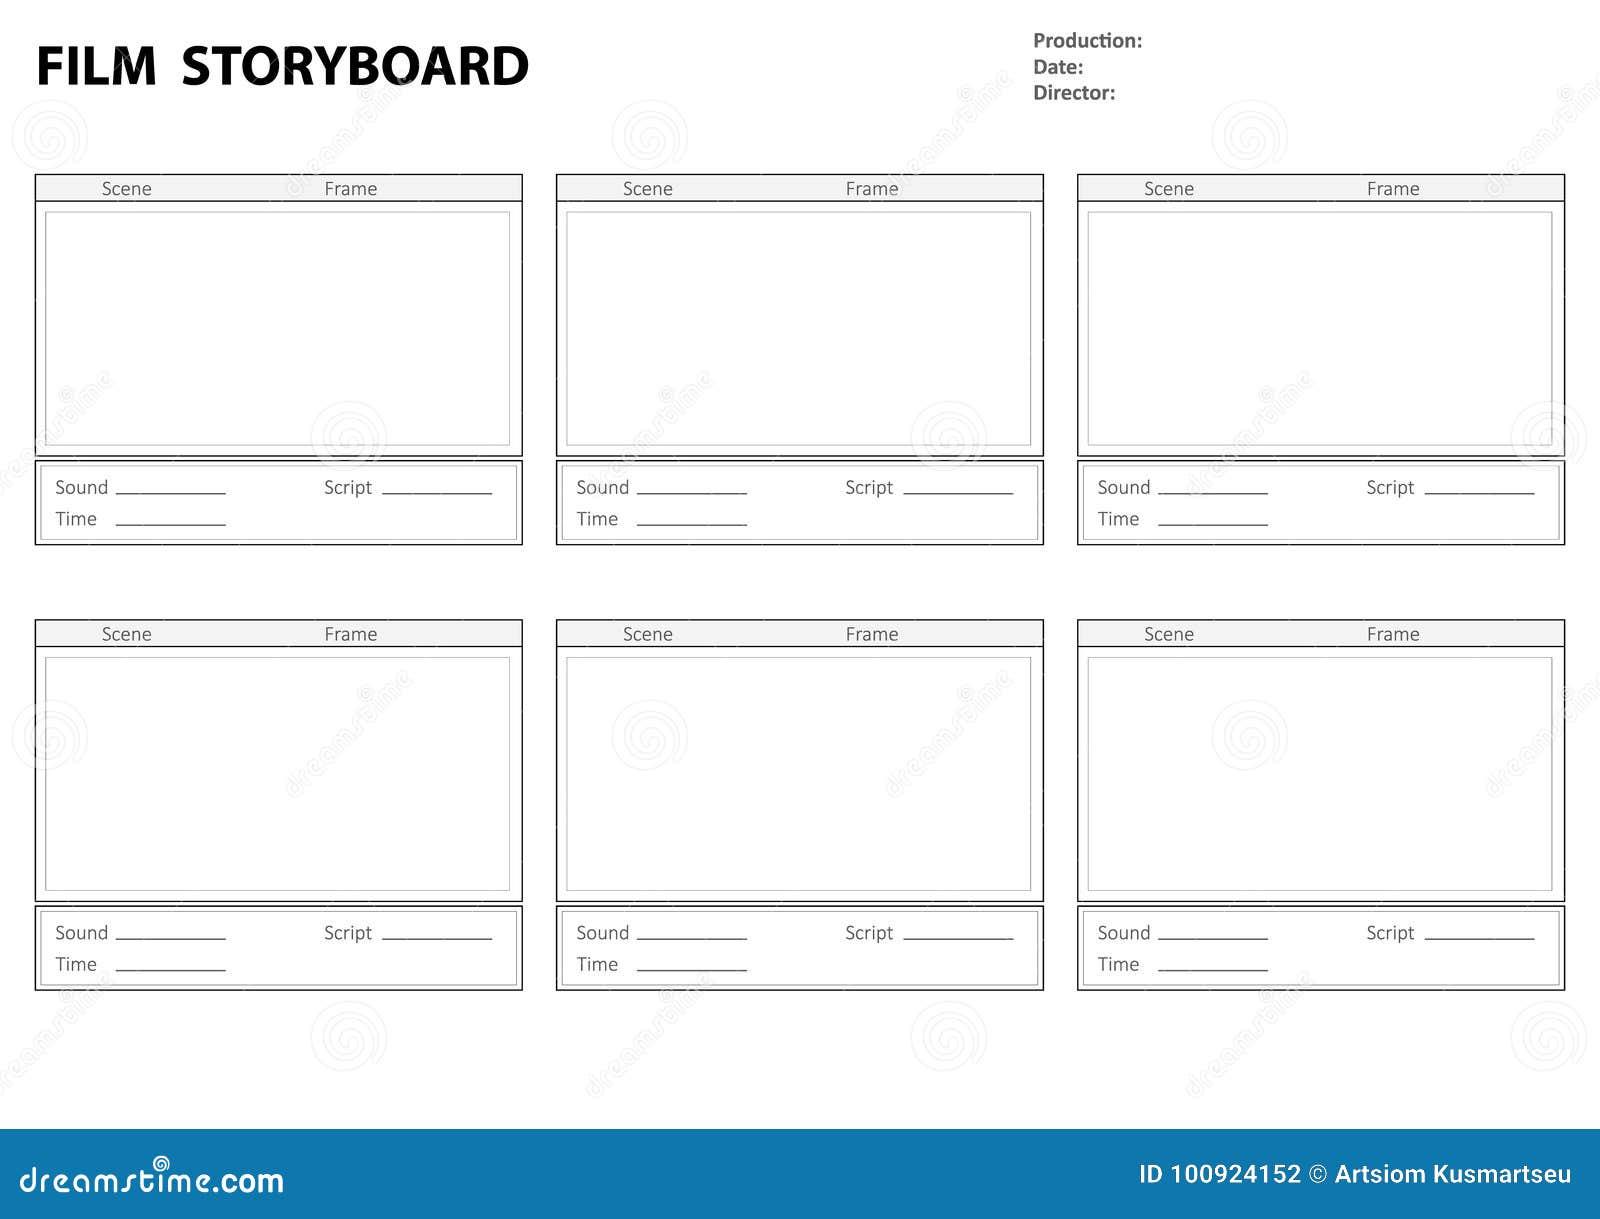 film storyboard template word - calibre de story board pour l 39 histoire de film